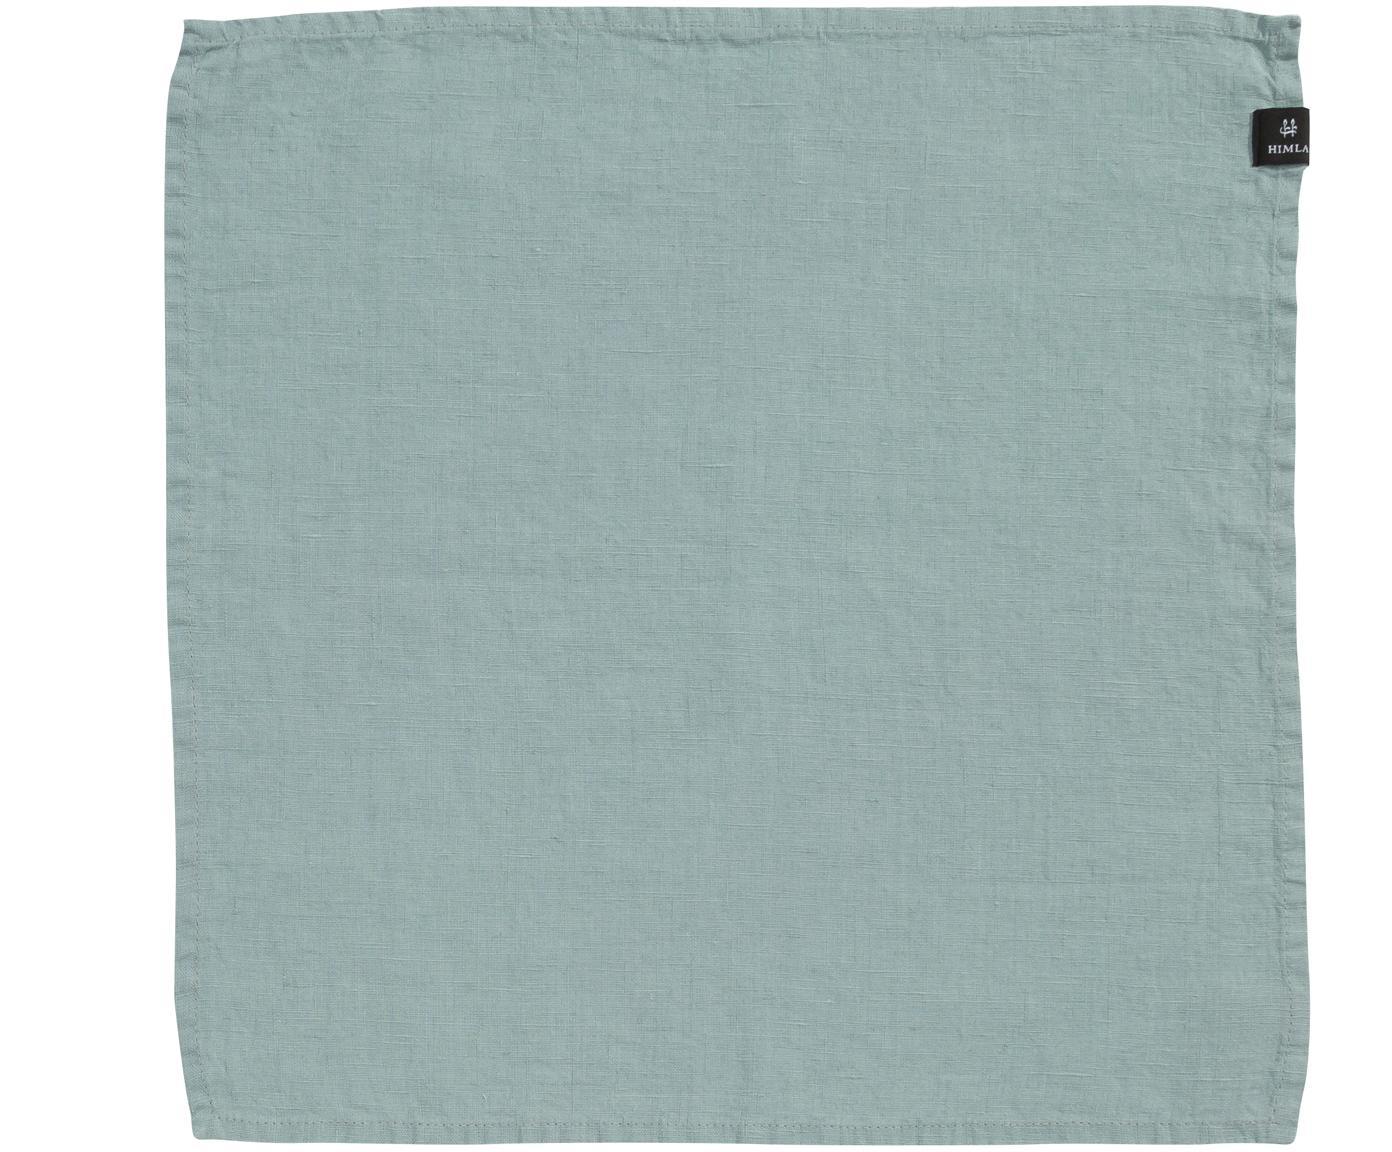 Linnen servetten Sunshine, 4 stuks, Linnen, Licht blauwgroen, 45 x 45 cm